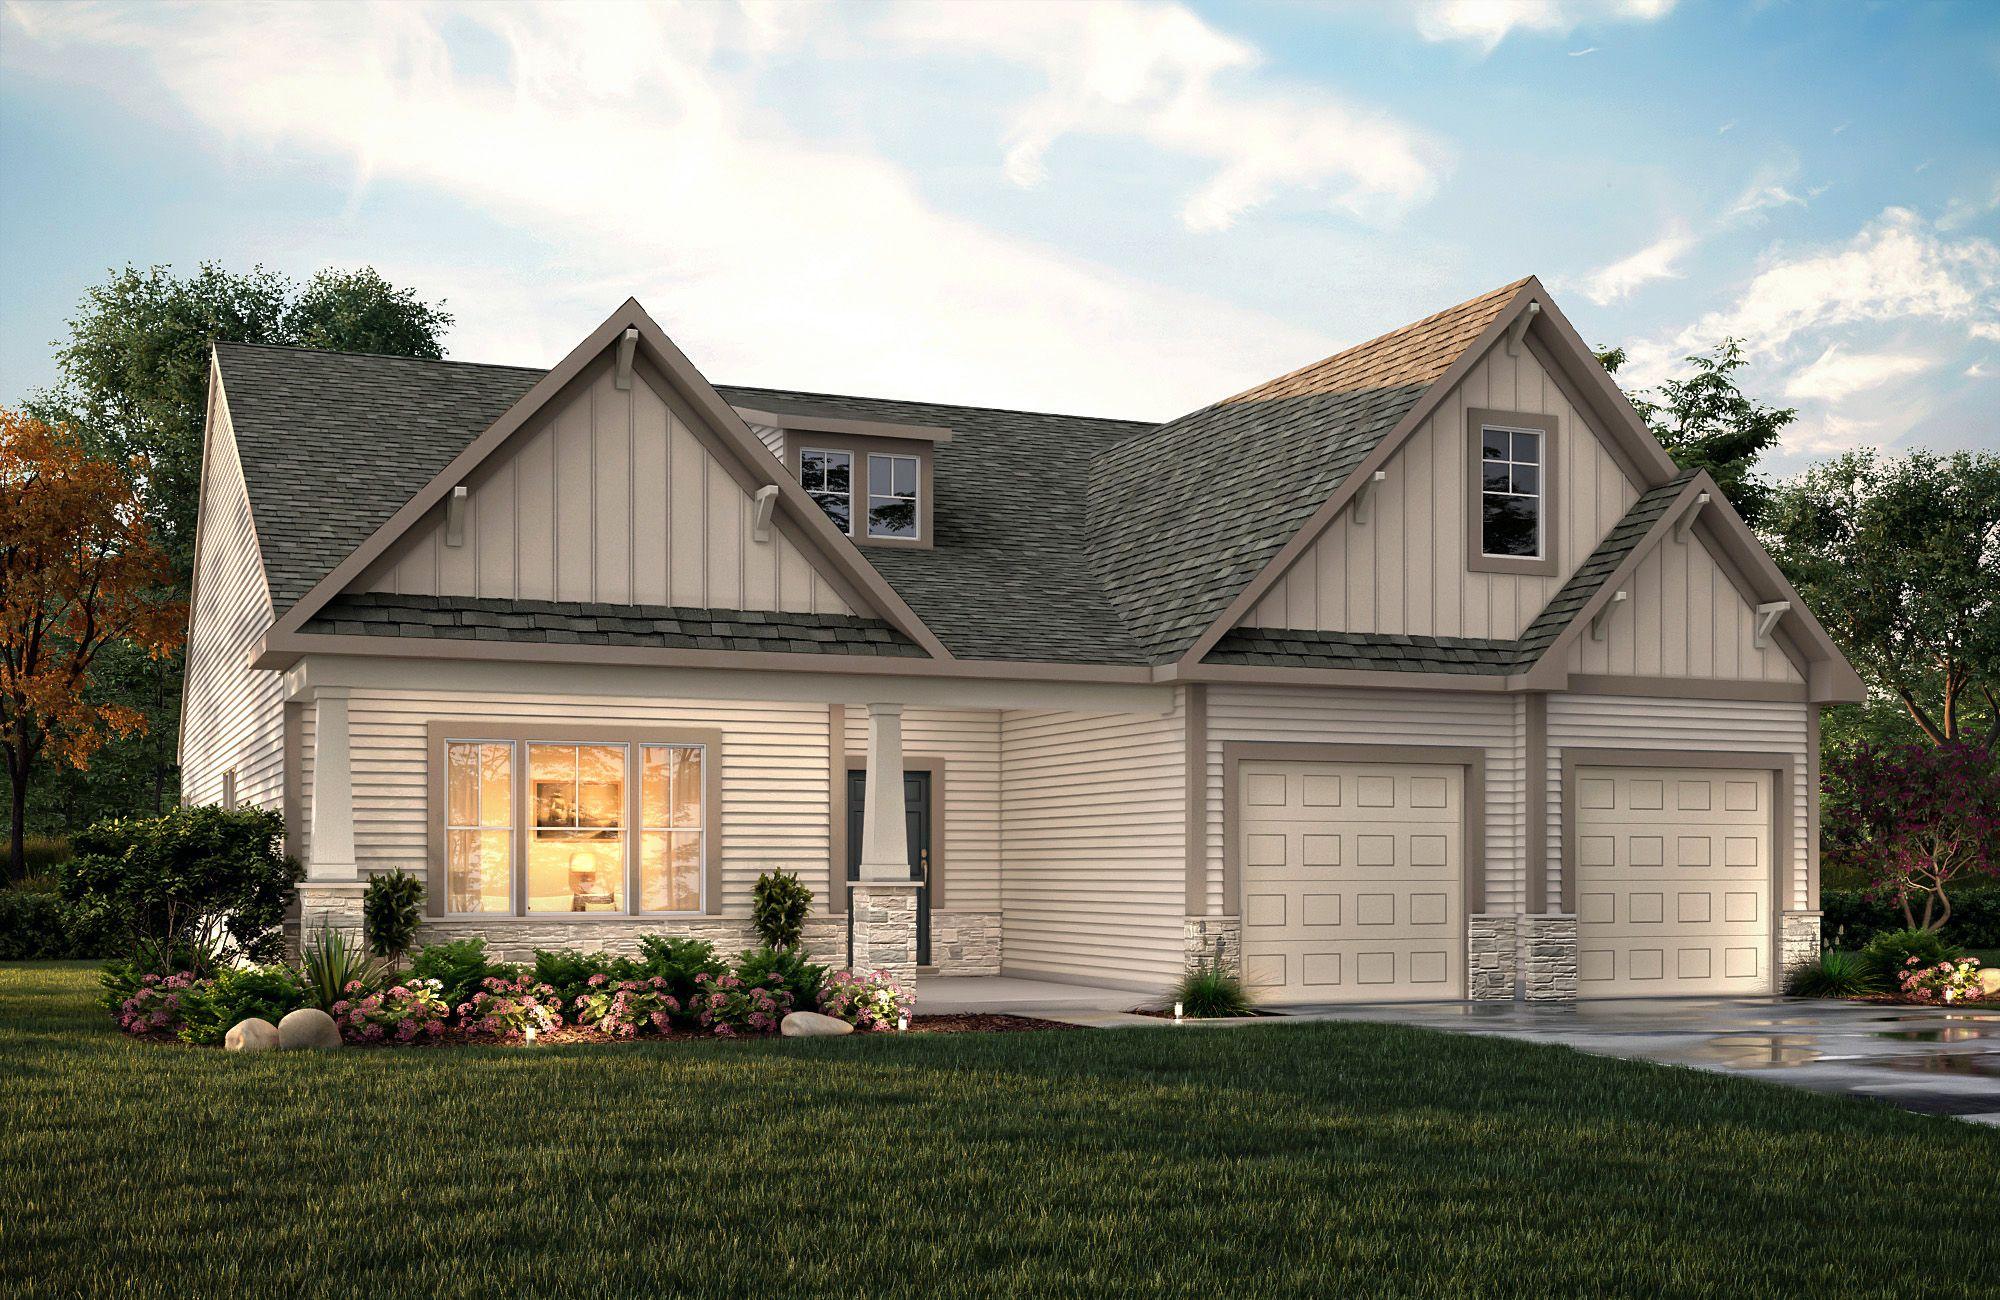 'Boulding Branch Estates' by True Homes - Triad in Greensboro-Winston-Salem-High Point